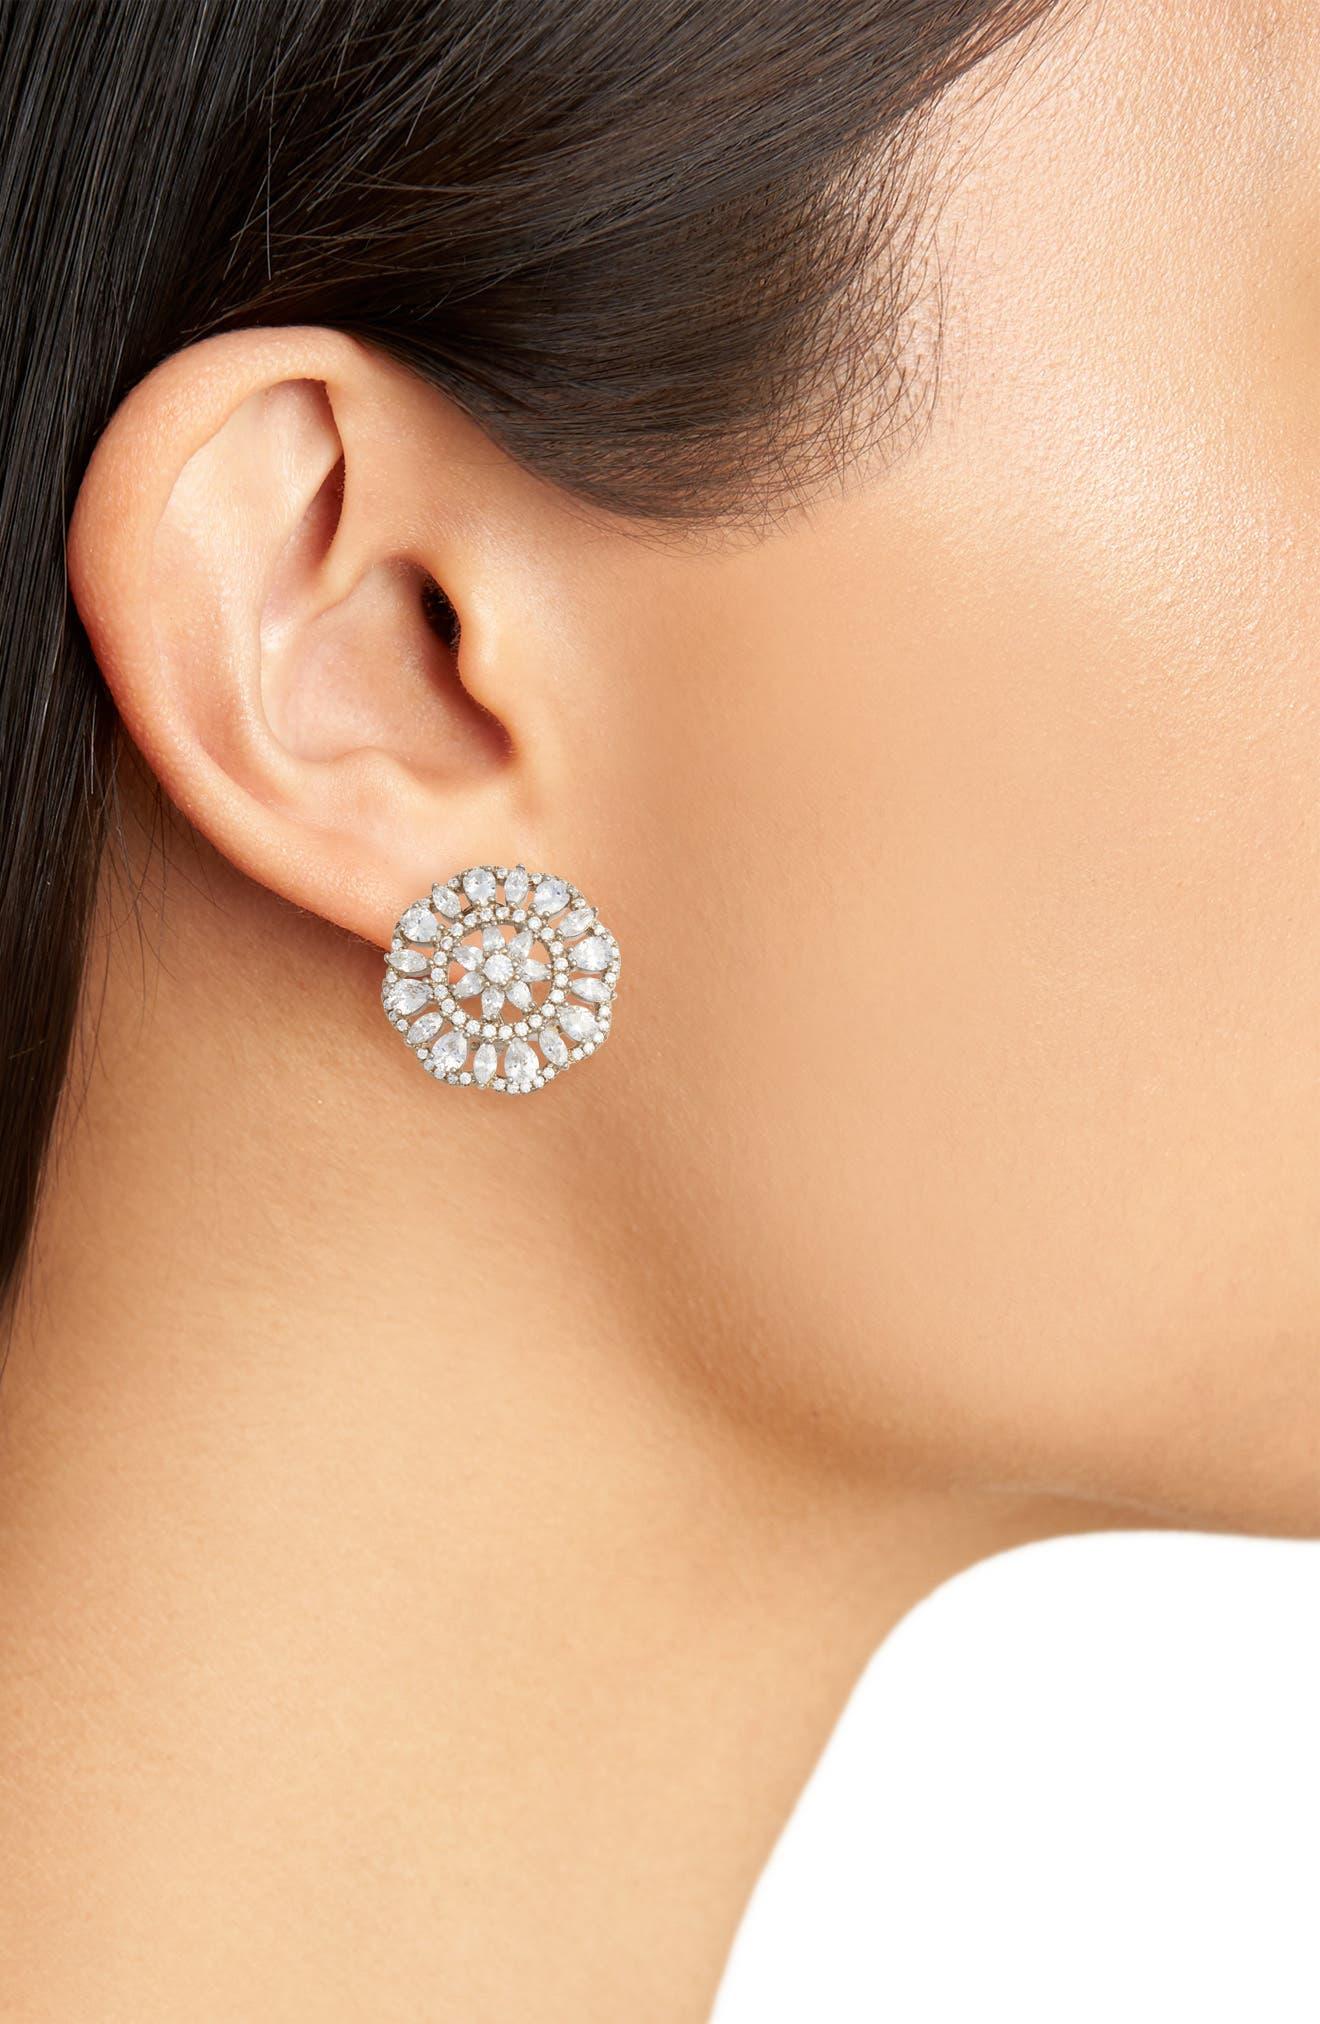 Sunburst Cubic Zirconia Clip Earrings,                             Alternate thumbnail 2, color,                             Silver/ White Cz